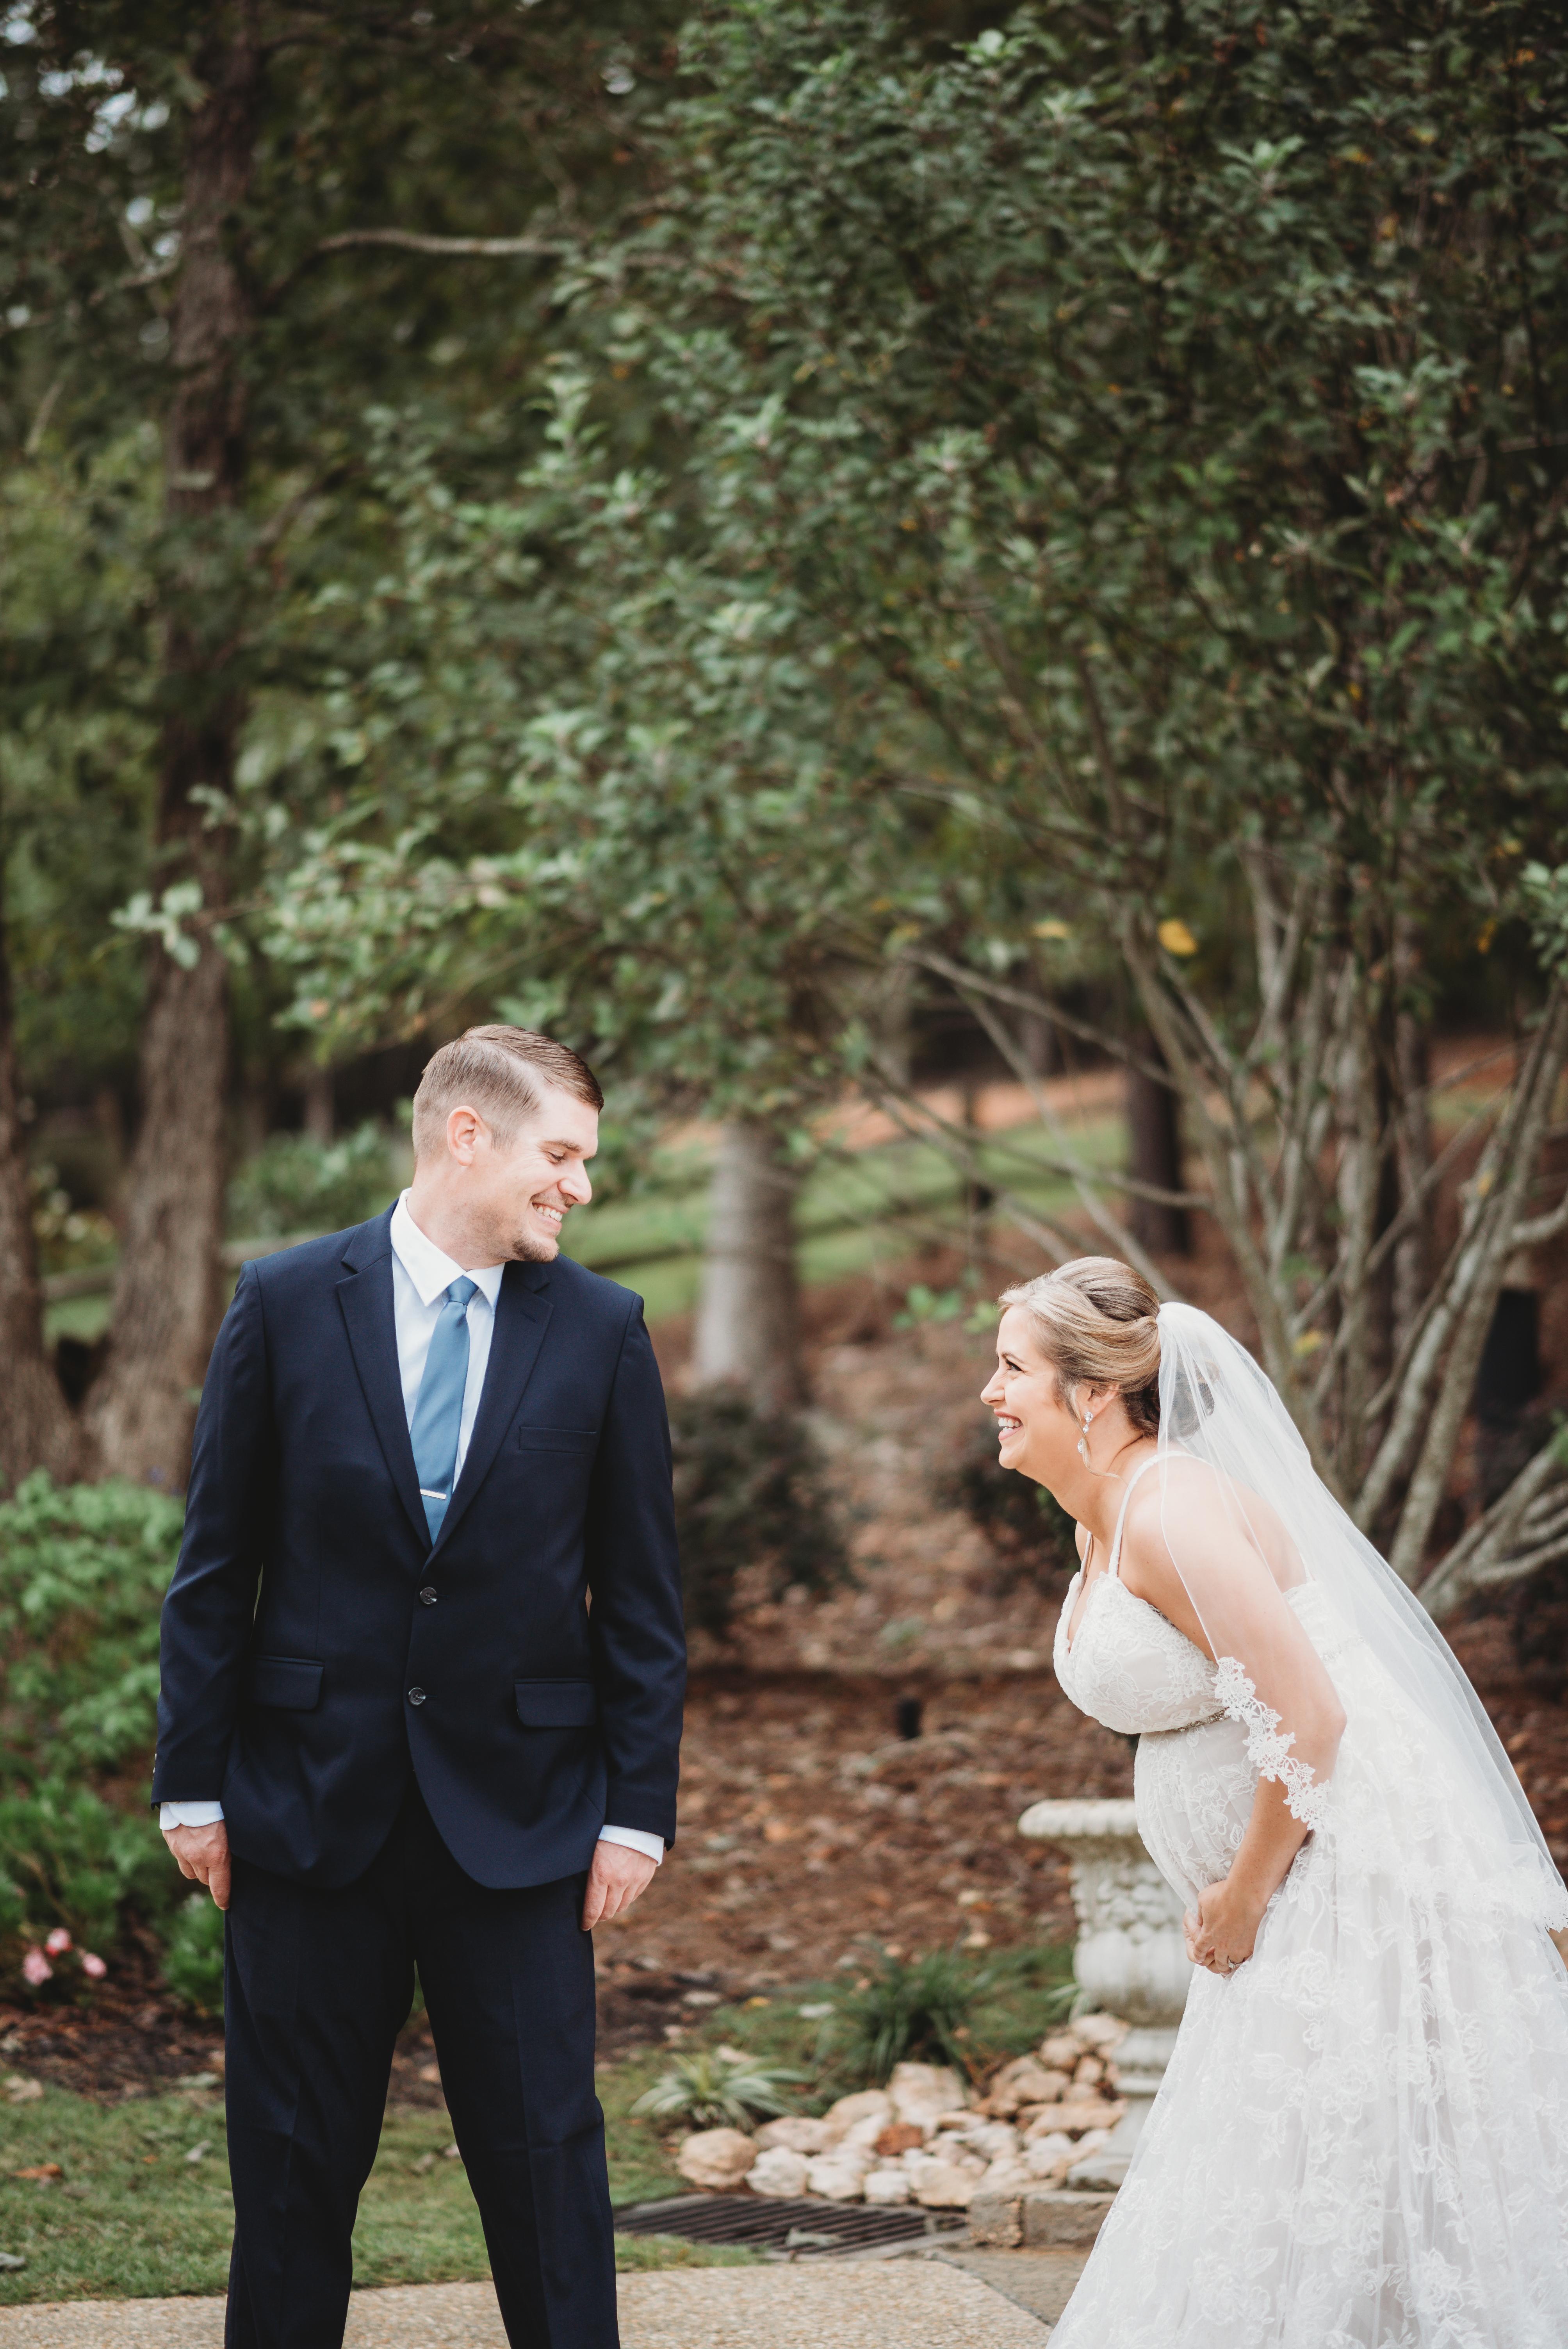 Rock Bottom Pond Fall Wedding Smoak Mary Decrescenzio